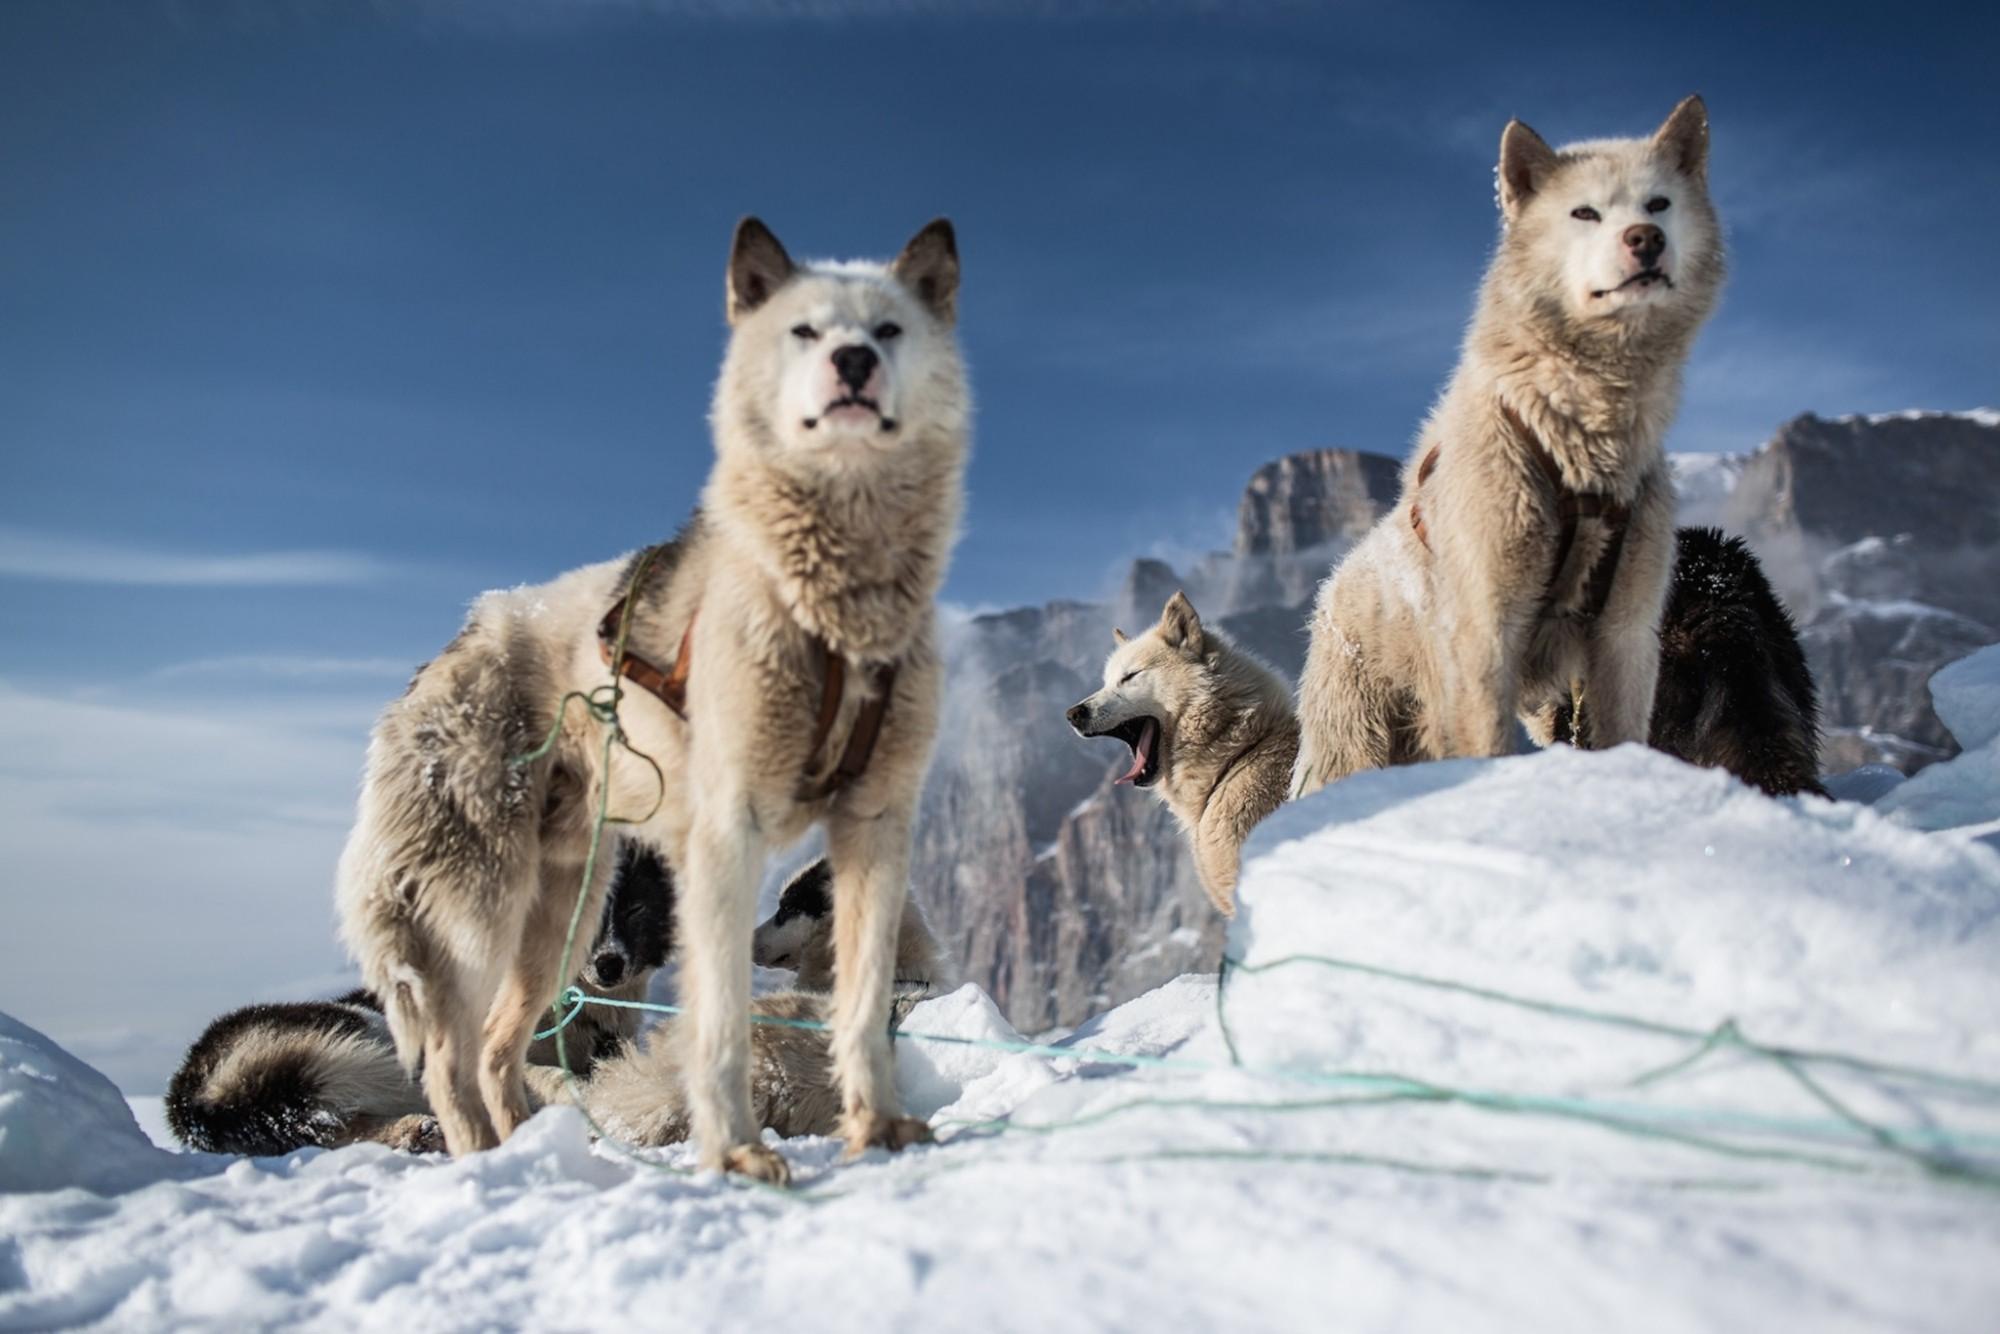 Cirili Jazbec 014-On-thin-ice-NEW